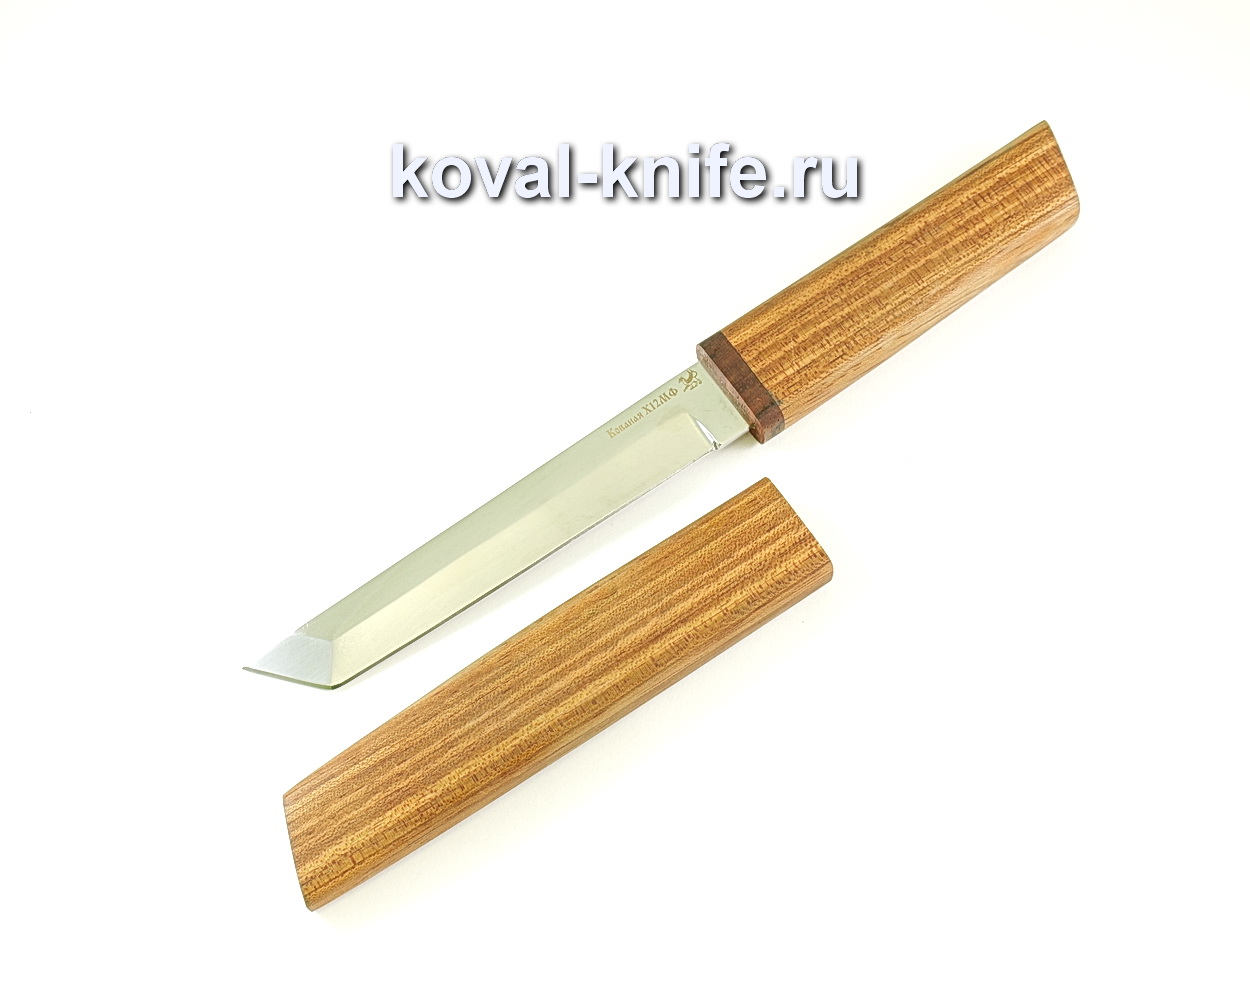 Нож Кобун (сталь х12мф), рукоять и ножны бубинга A079